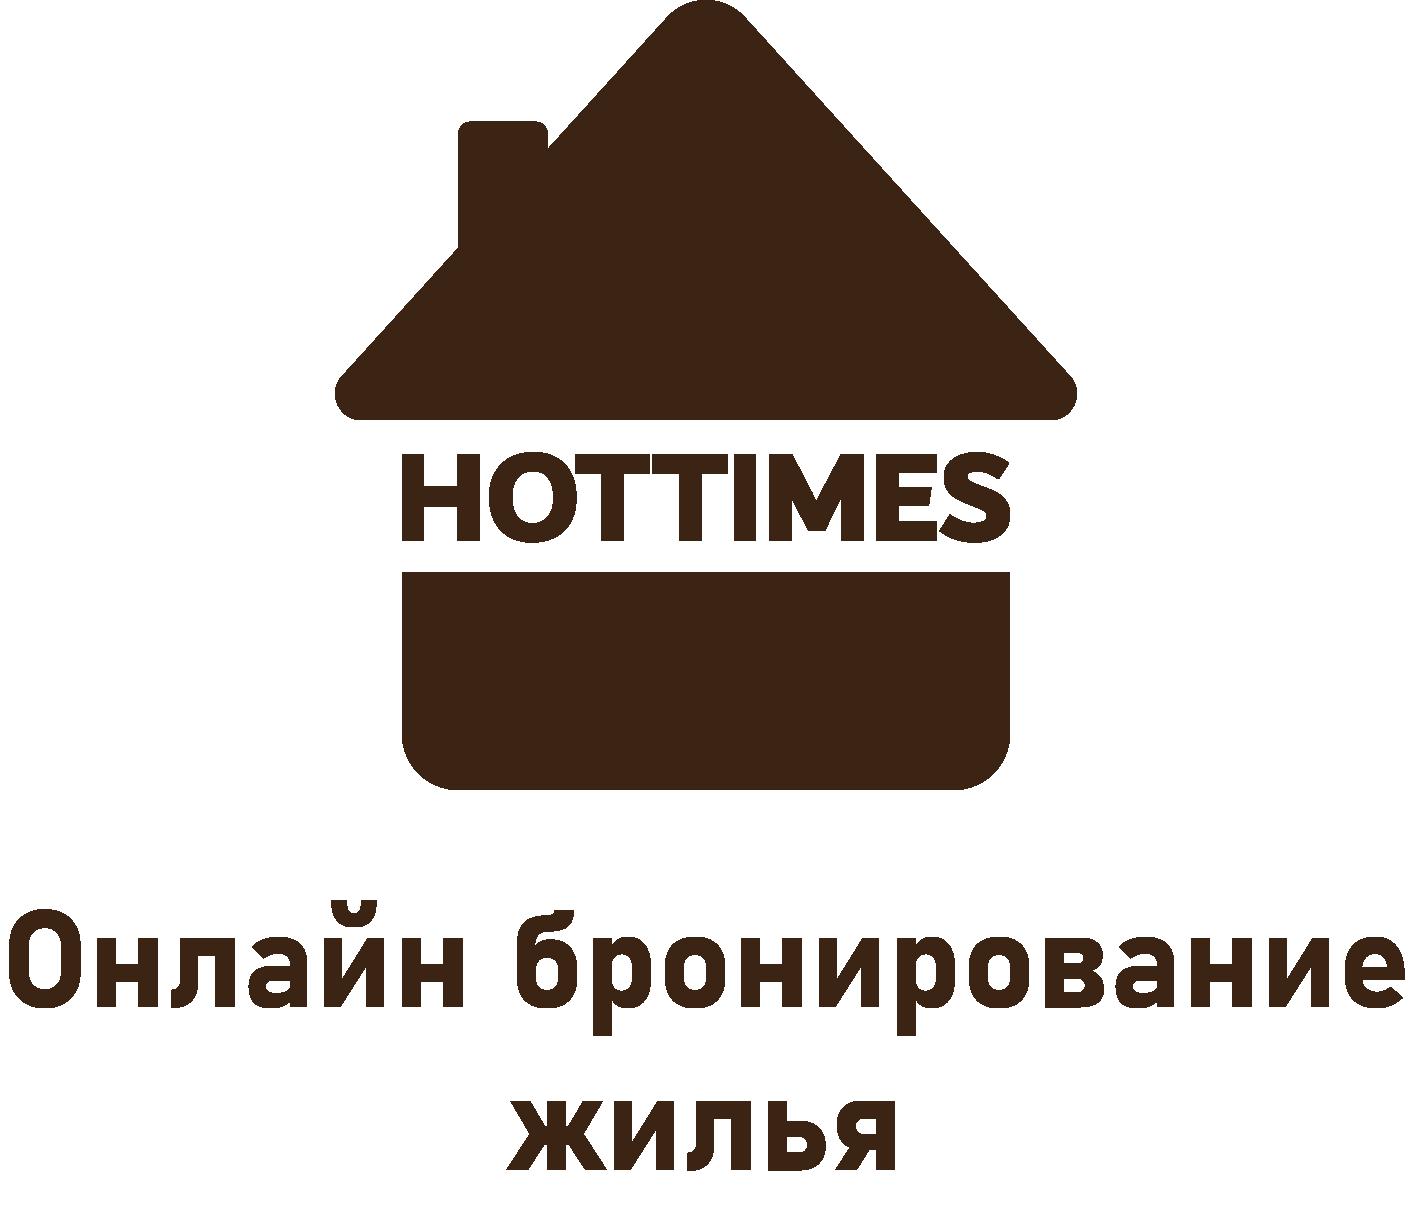 Hottimes